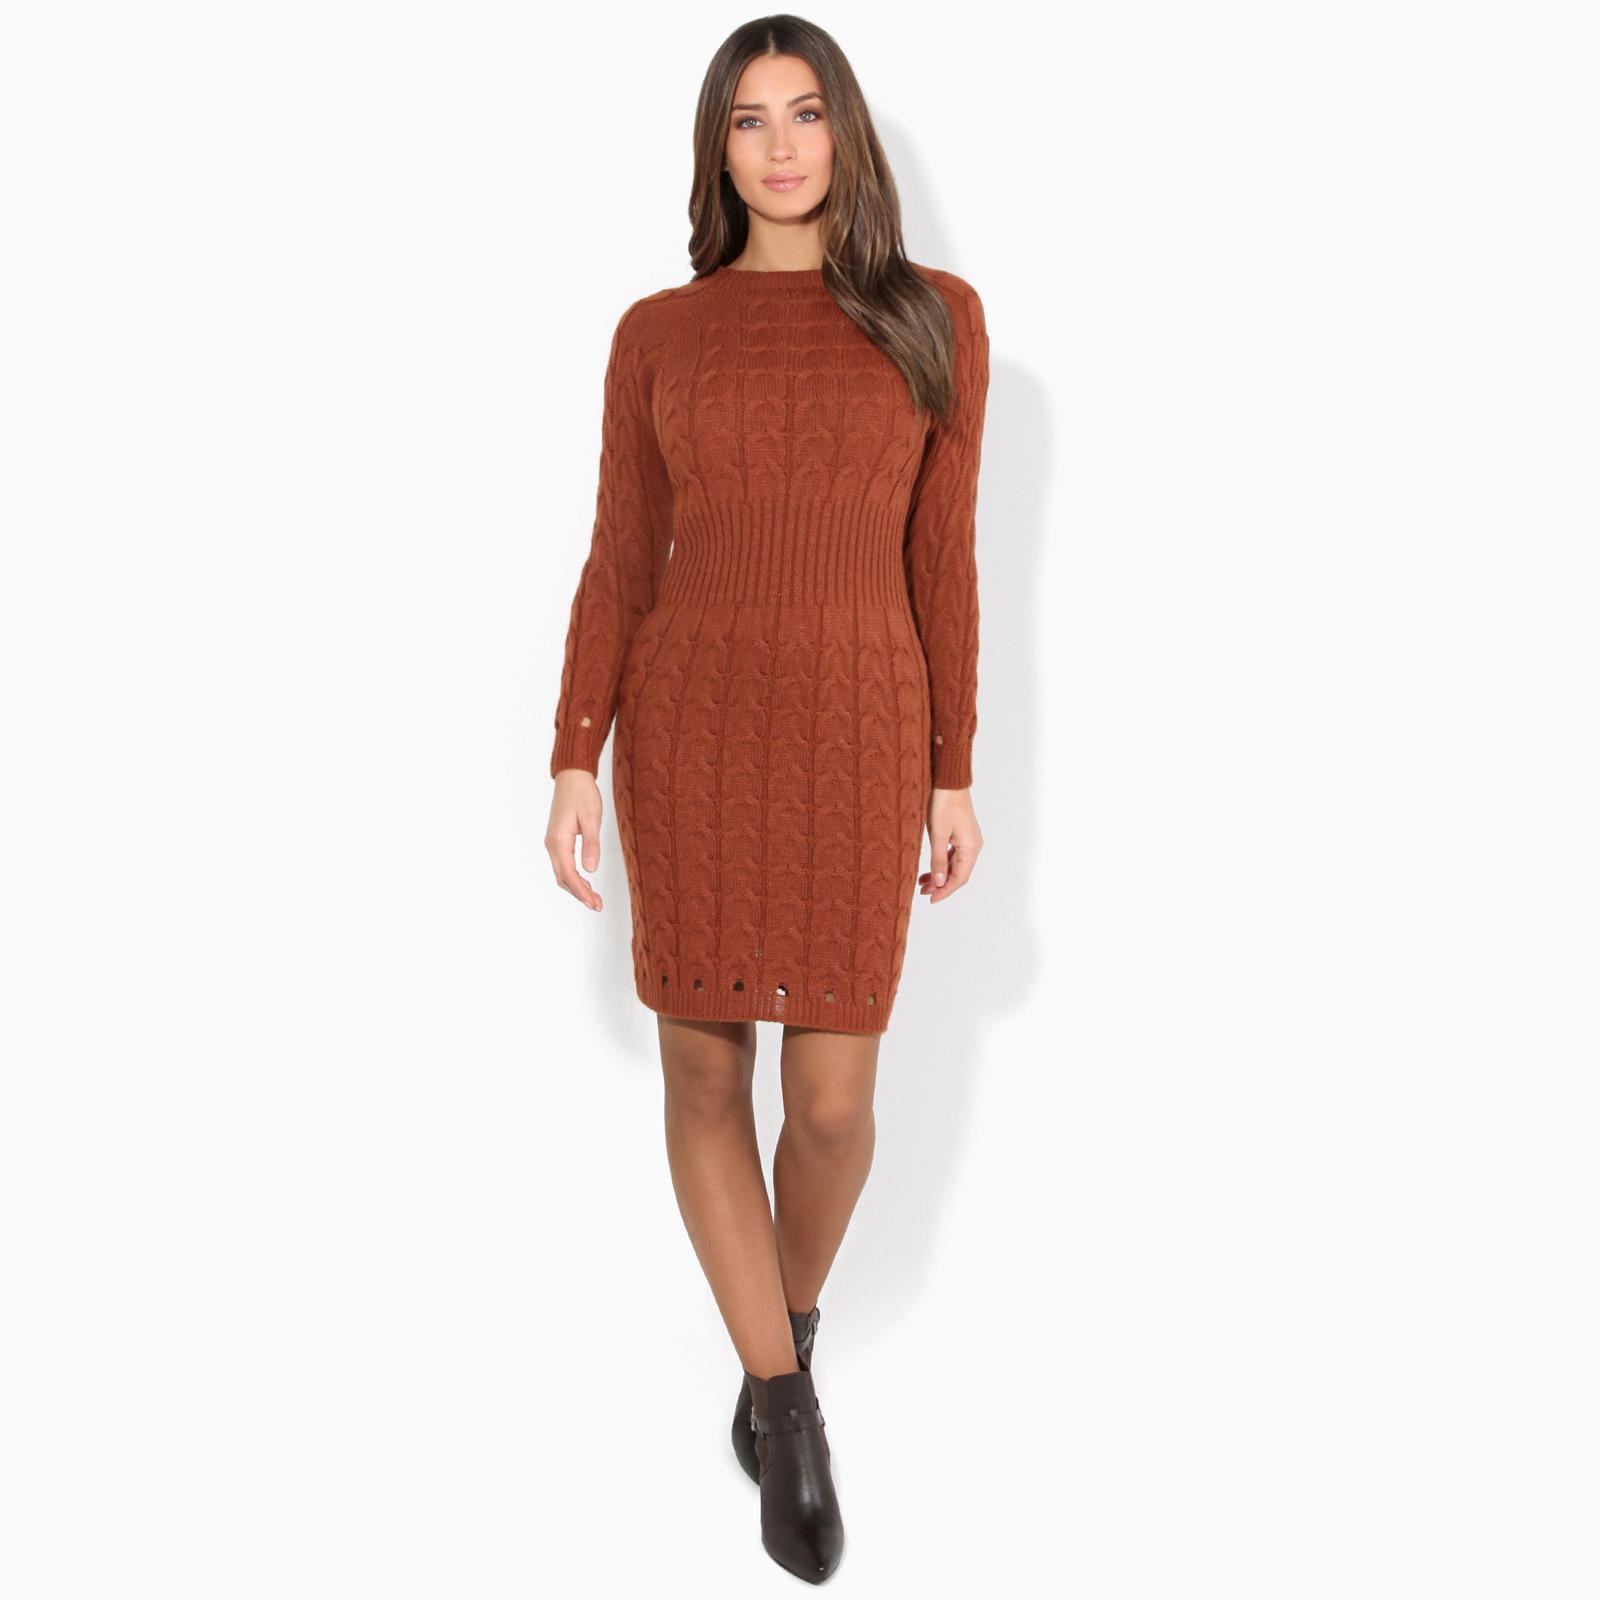 Womens-Ladies-Jumper-Dress-Longsleeve-Mini-Warm-Winter-Knit-Top-Bodycon thumbnail 18